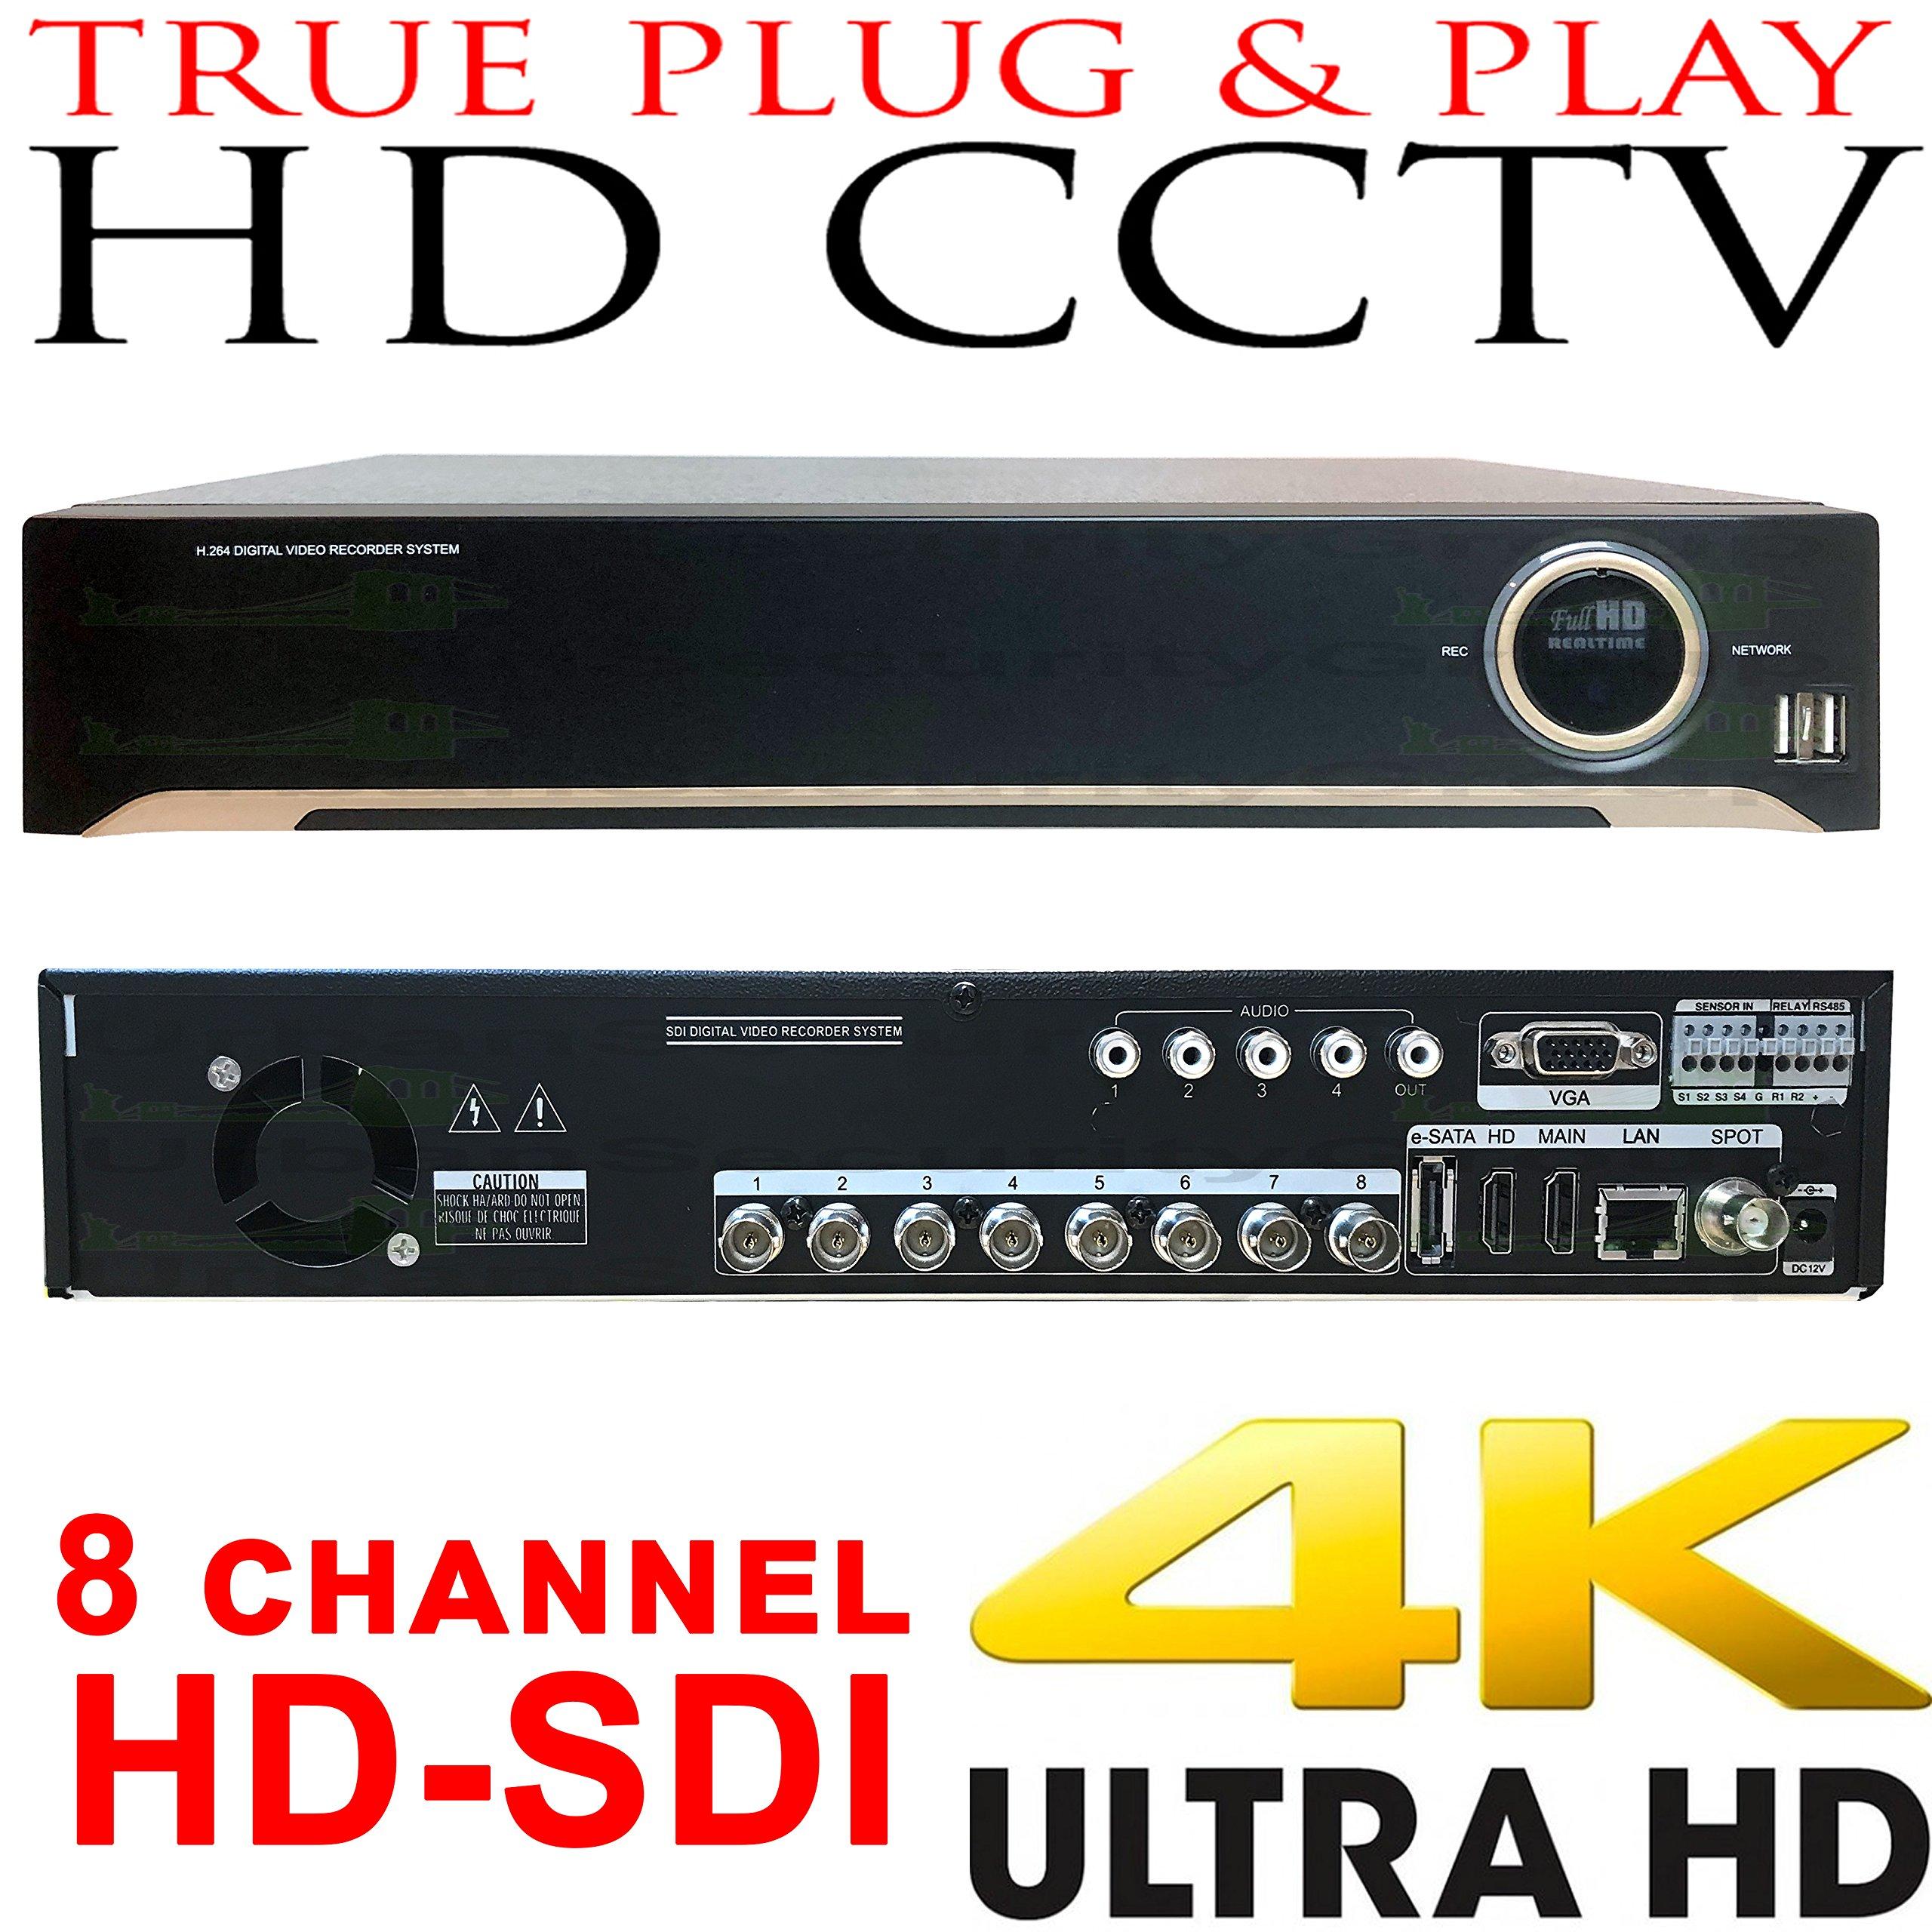 USG Business Grade 4MP 8 Channel HD-SDI Security DVR + 4TB HDD : Up To 4MP Video Resolution, 8x BNC HD Video-In, 2x SATA, USB, 2x HDMI + VGA + Spot BNC, RCA Audio, RS232C, Alarm : Free Phone App by Urban Security Group (Image #1)